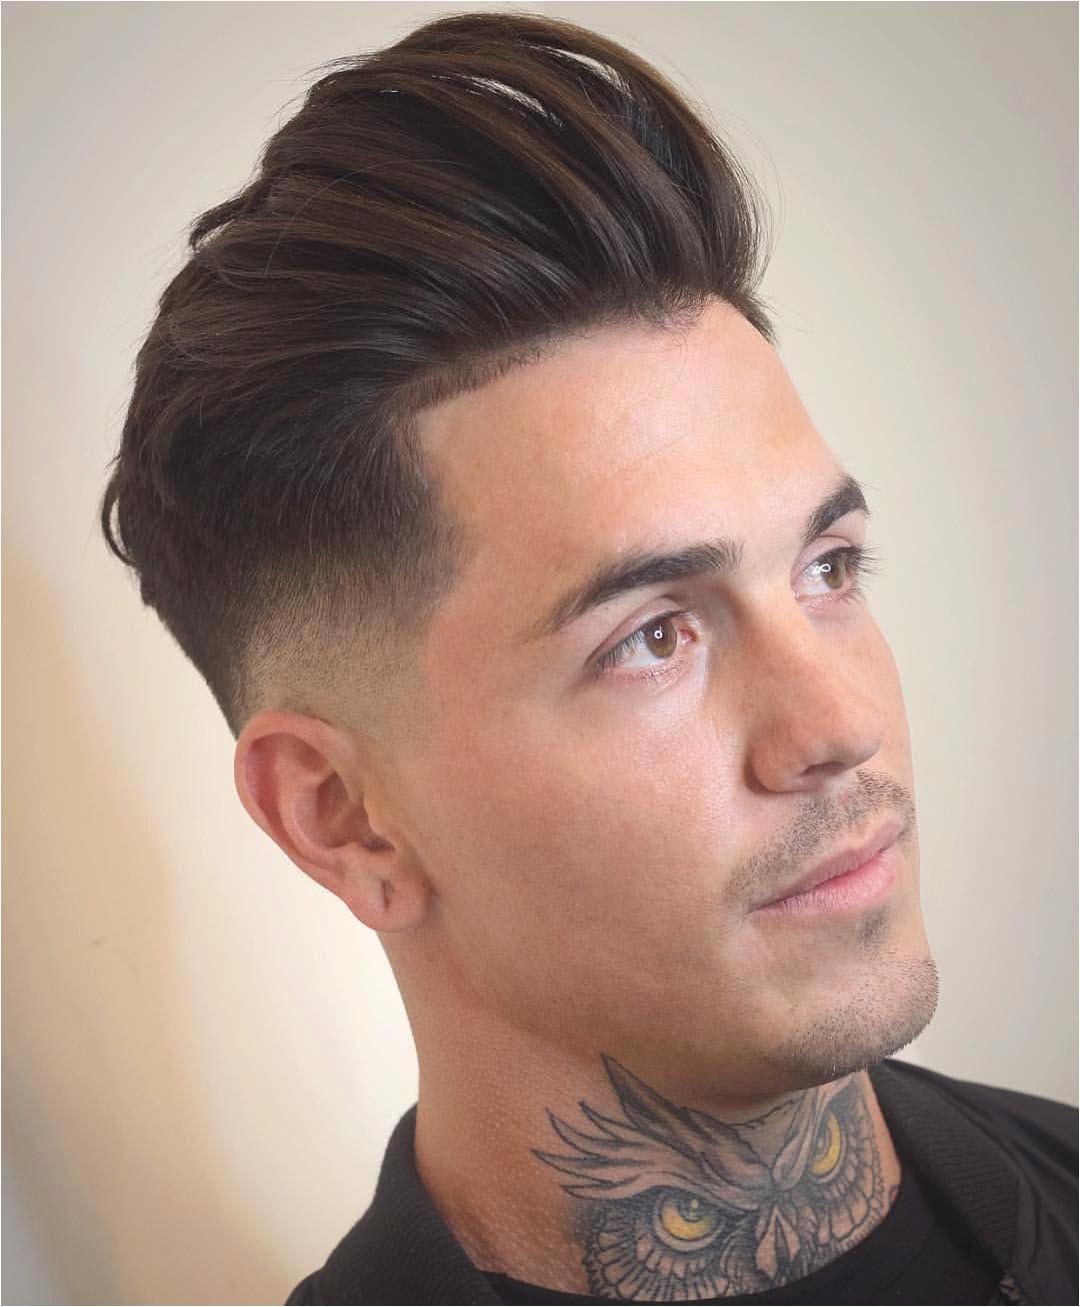 "Mens Hair Cut Styles Best Pozrite Si Tºto Fotku Na Instagrame Od Pou…¾vate""¾a Guyshair"